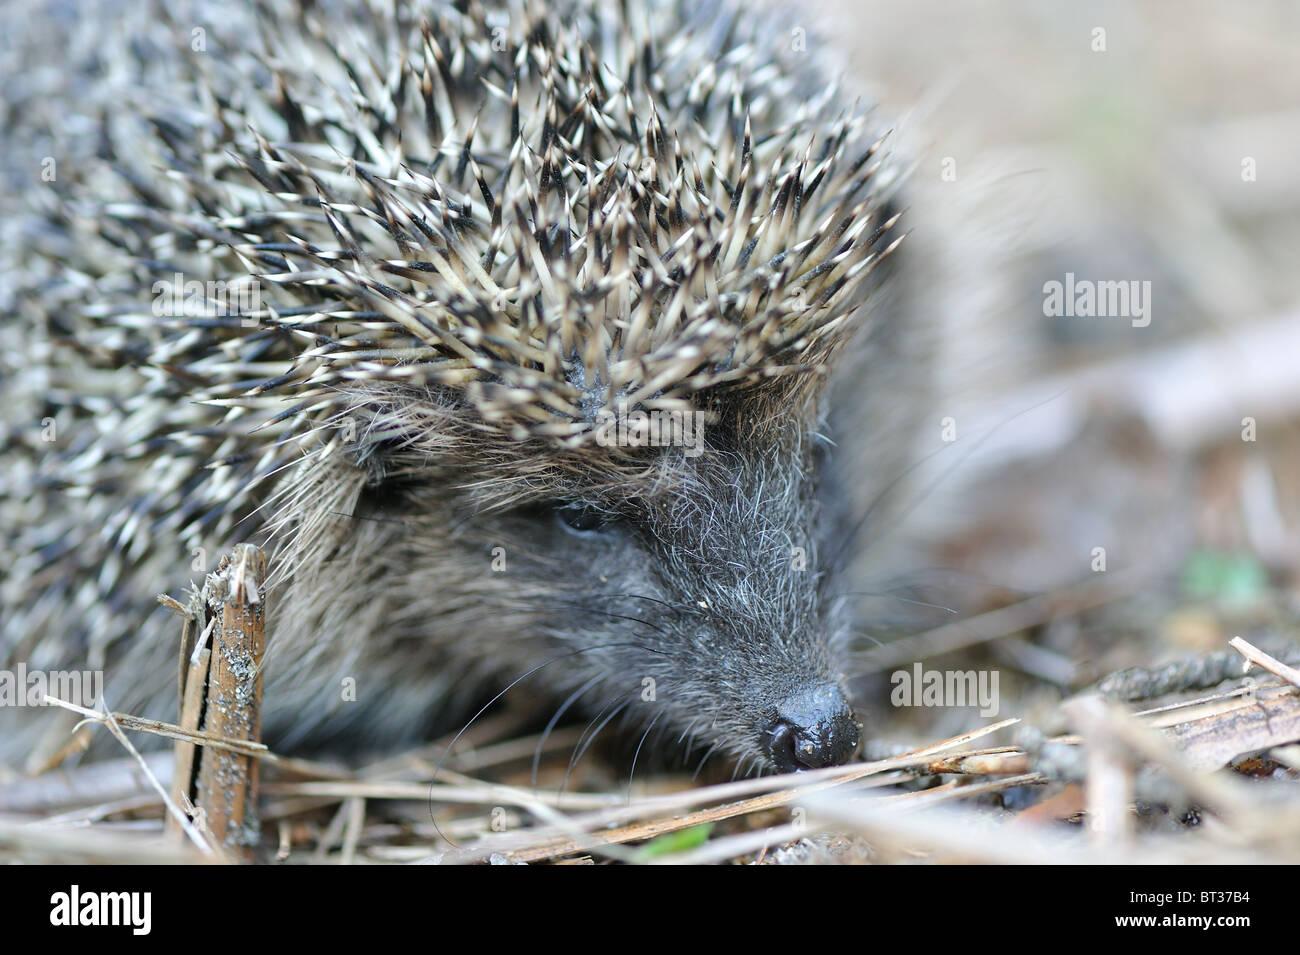 Western European hedgehog (Erinaceus europaeus) - portrait - Stock Image